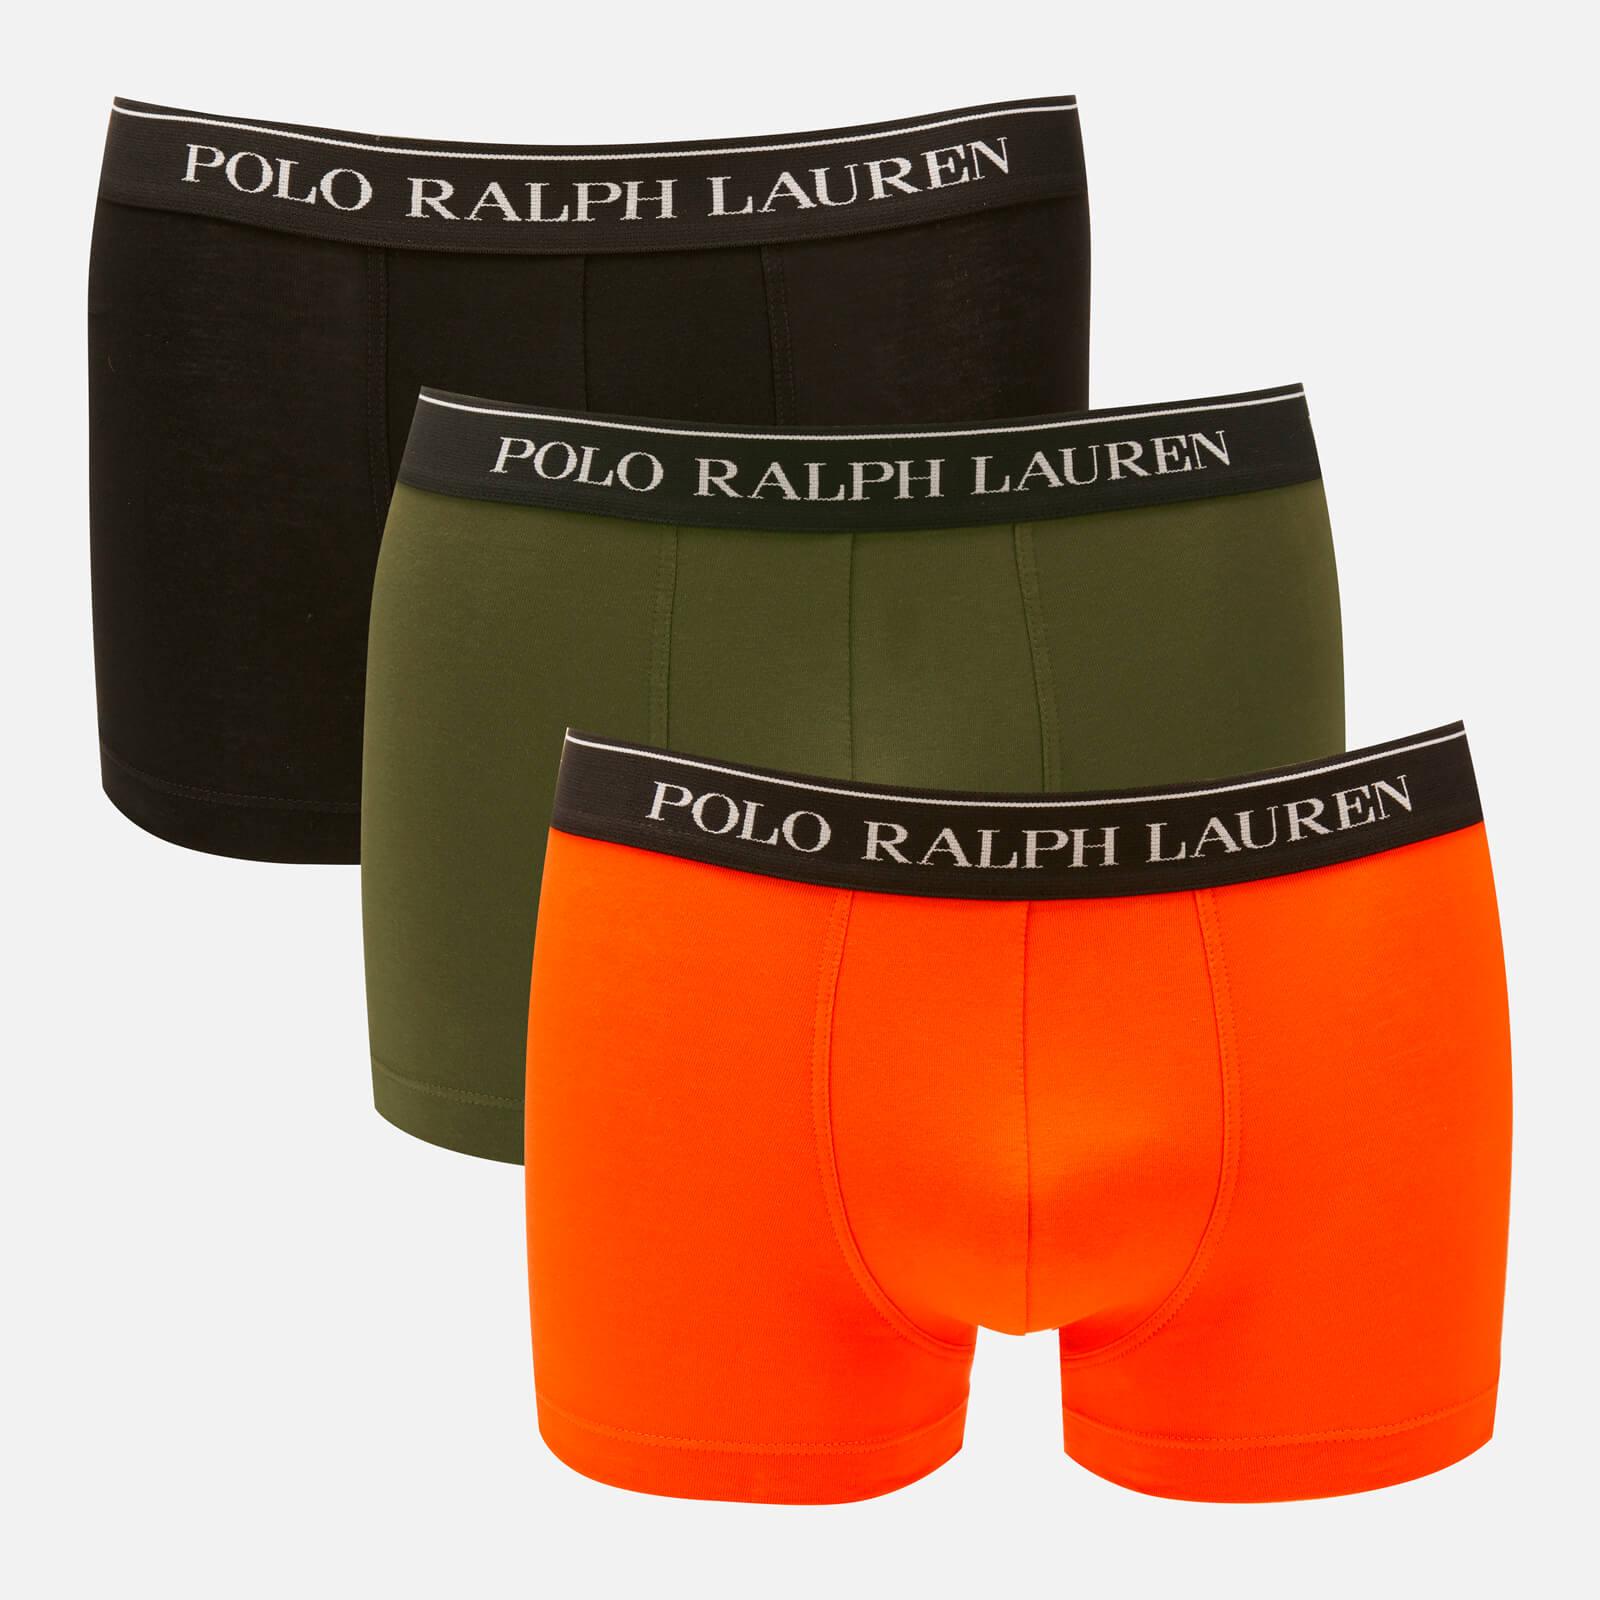 3e5dceee62 Polo Ralph Lauren Men's 3 Pack Classic Trunk Boxer Shorts - Black/Spanish  Olive/Orange Mens Underwear | TheHut.com